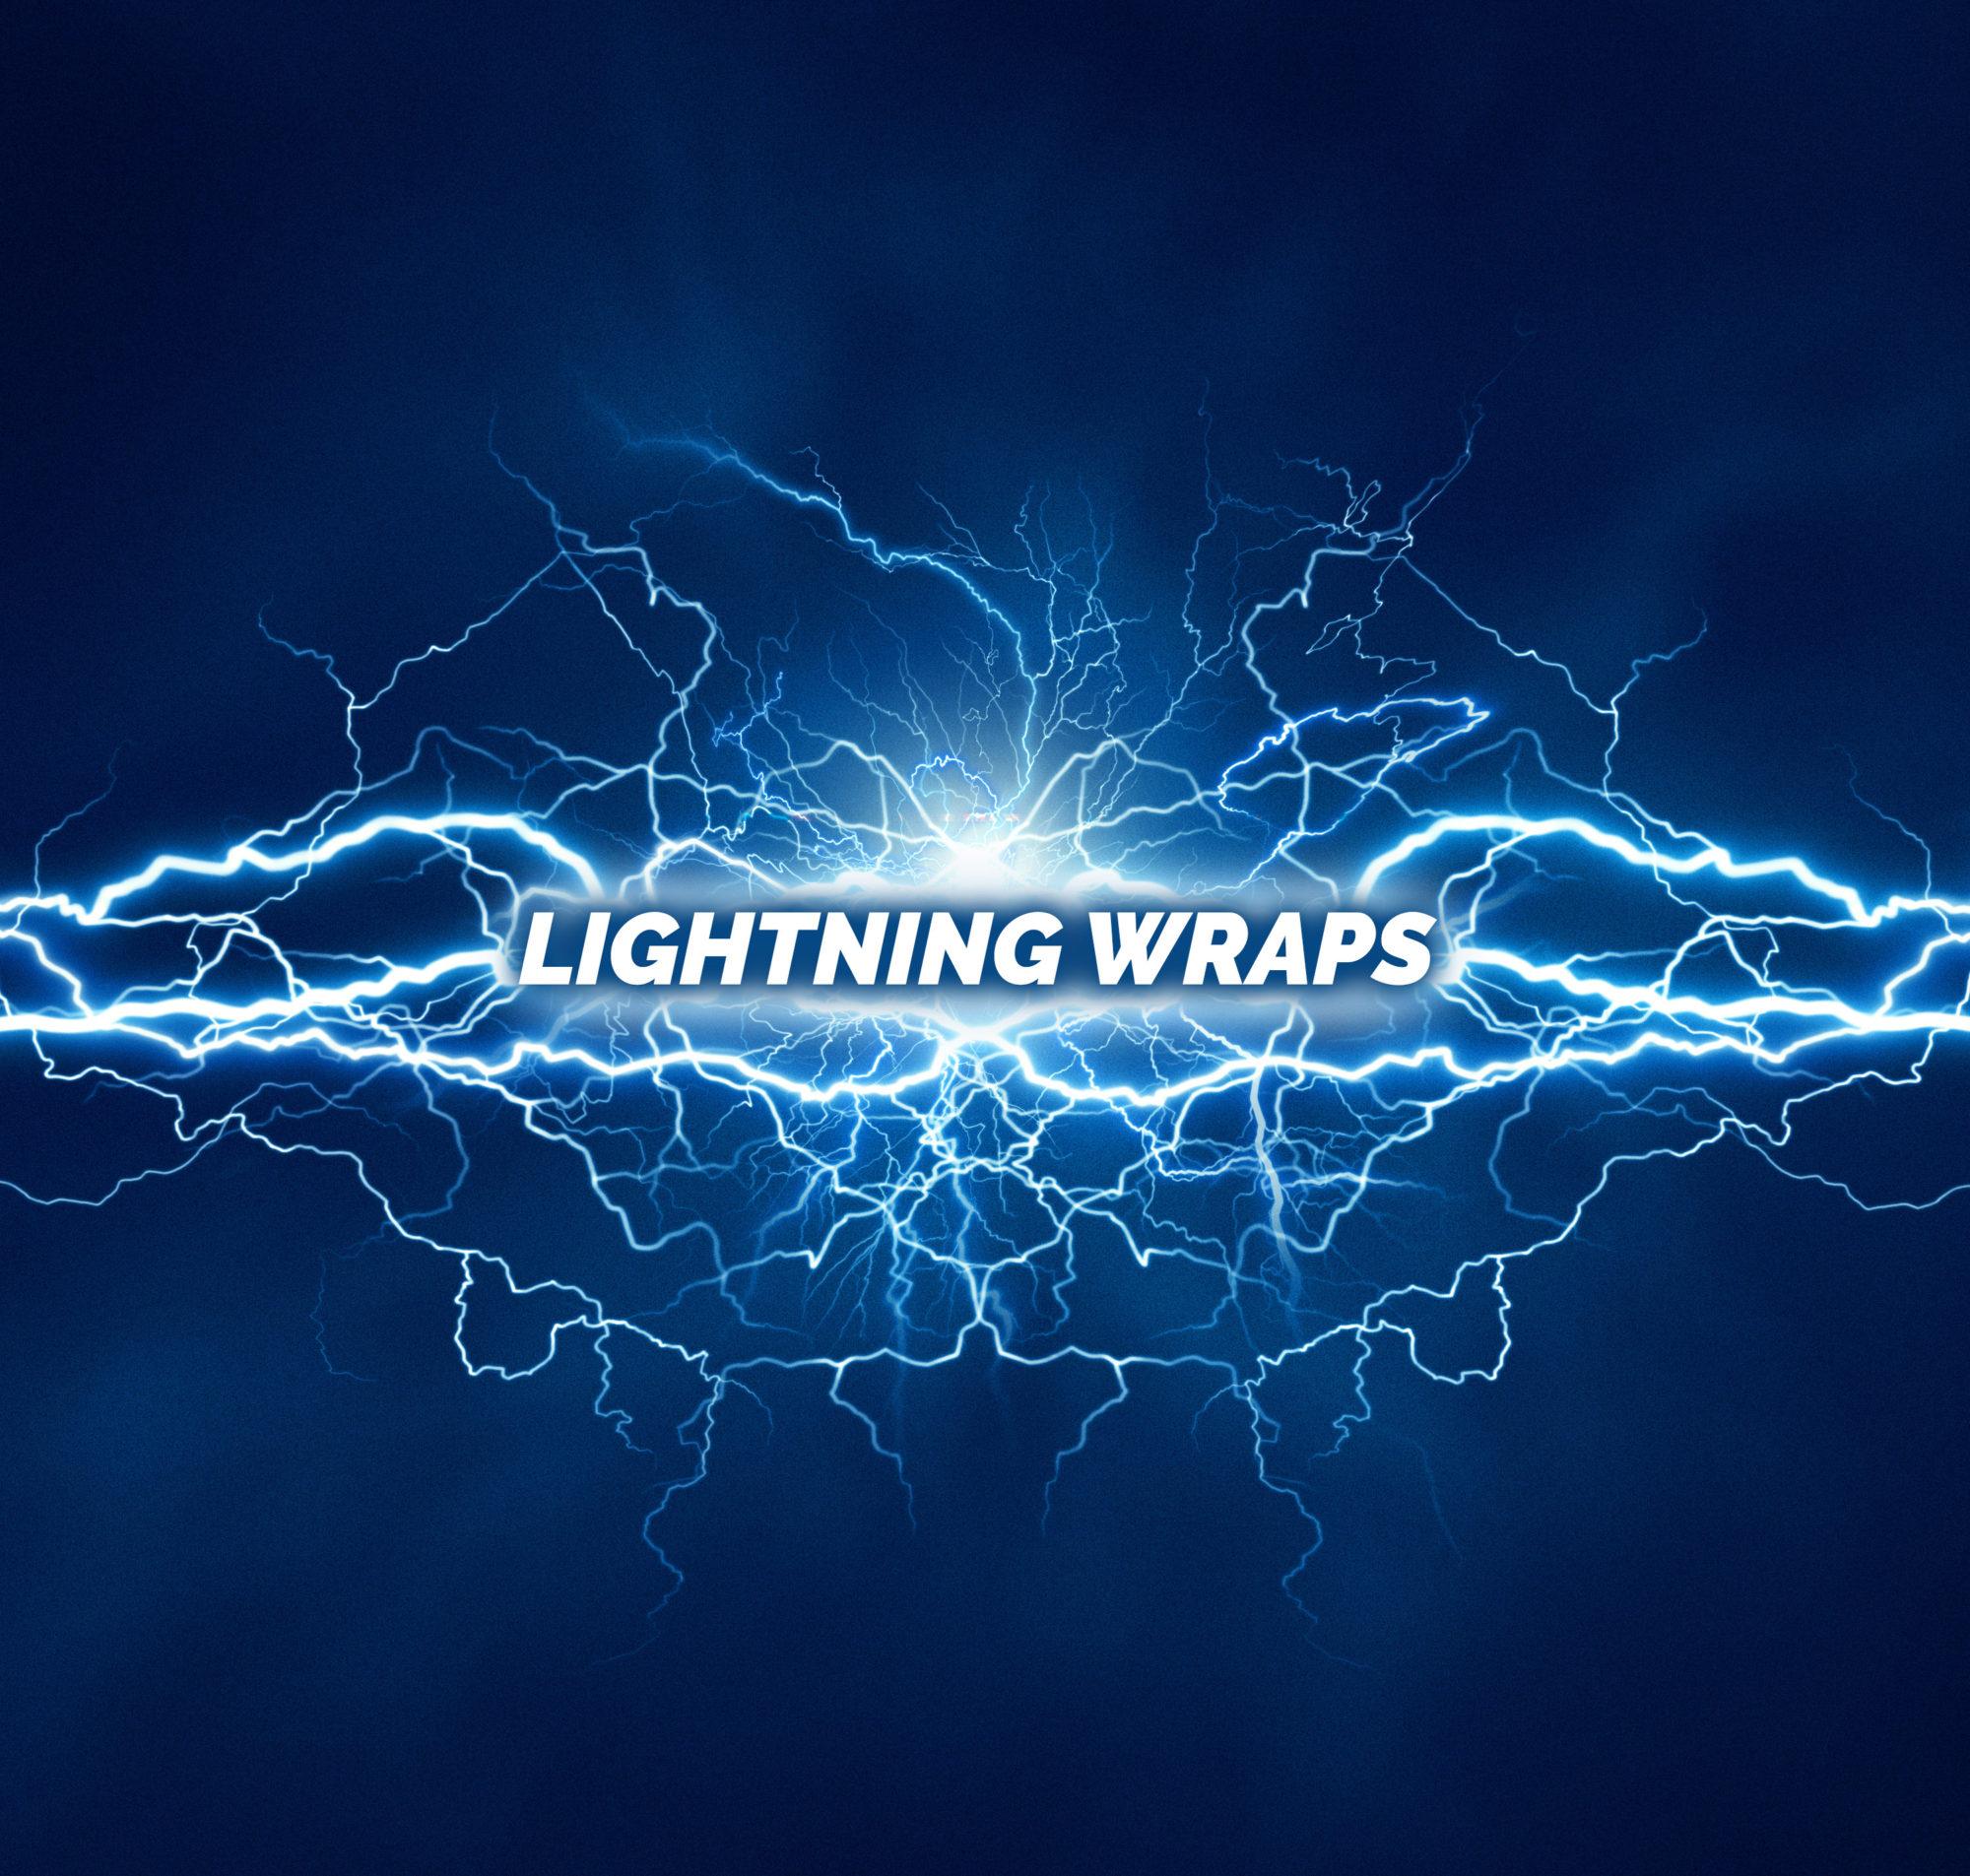 Lightning Wraps